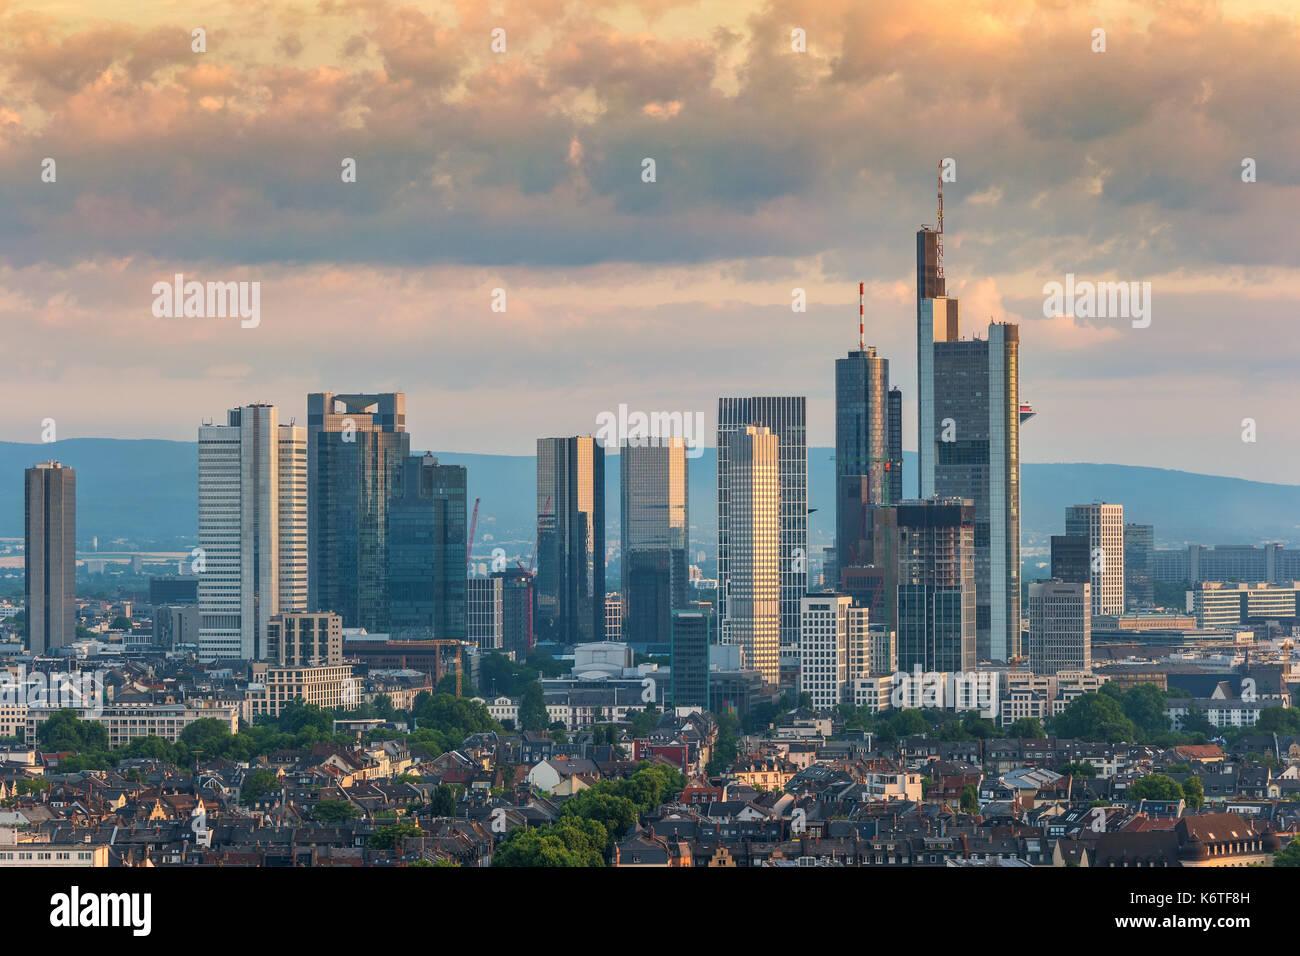 Frankfurt sunrise city skyline at business district, Frankfurt, Germany - Stock Image